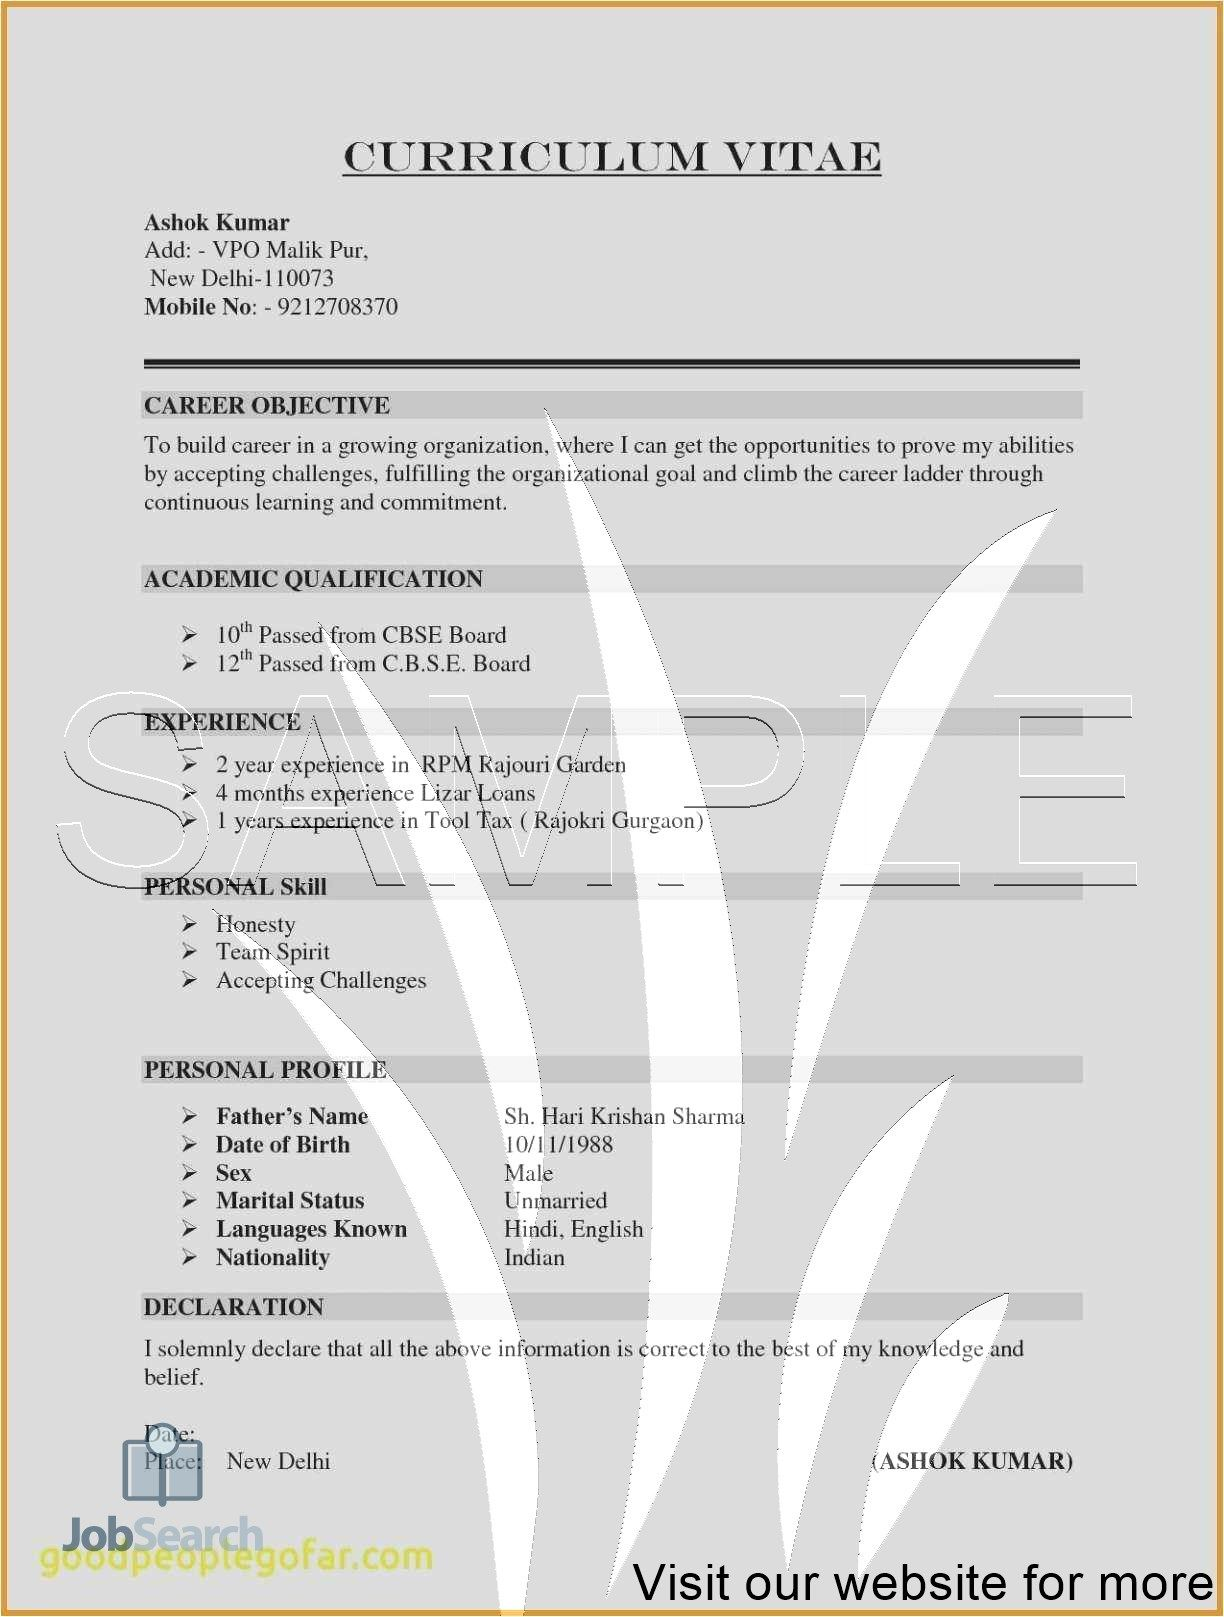 Resume Template Free Mac In 2020 Resume Template Free Job Resume Resume Design Template